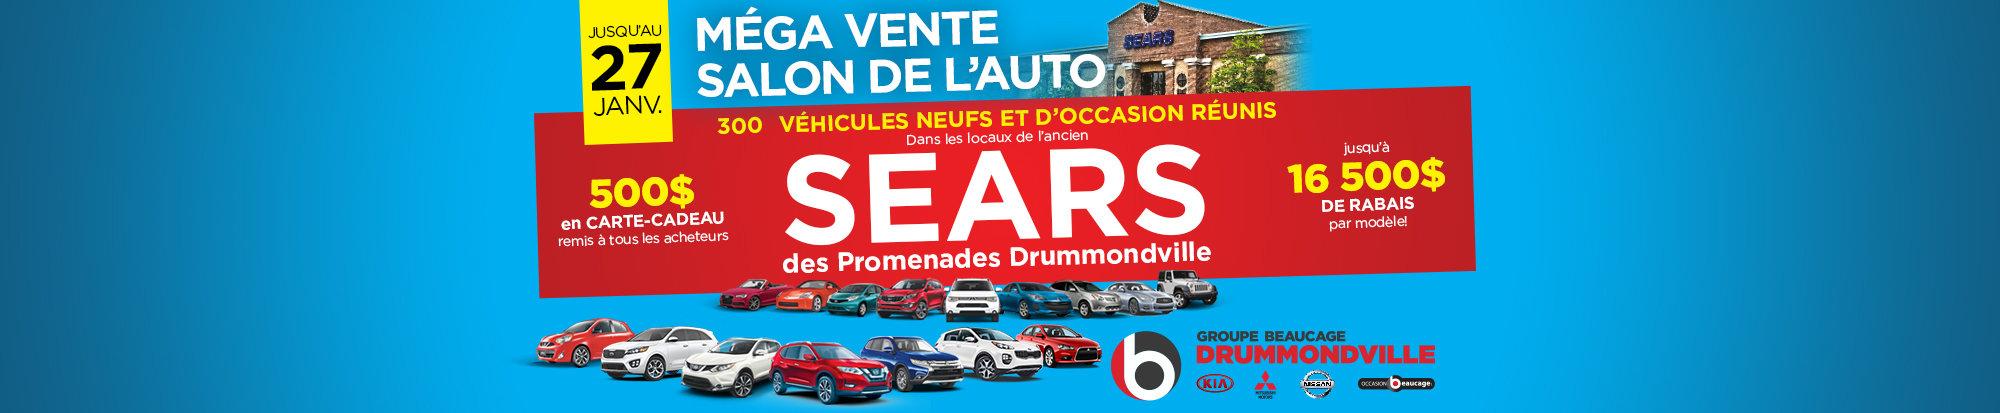 Mega vente salon de l'auto web